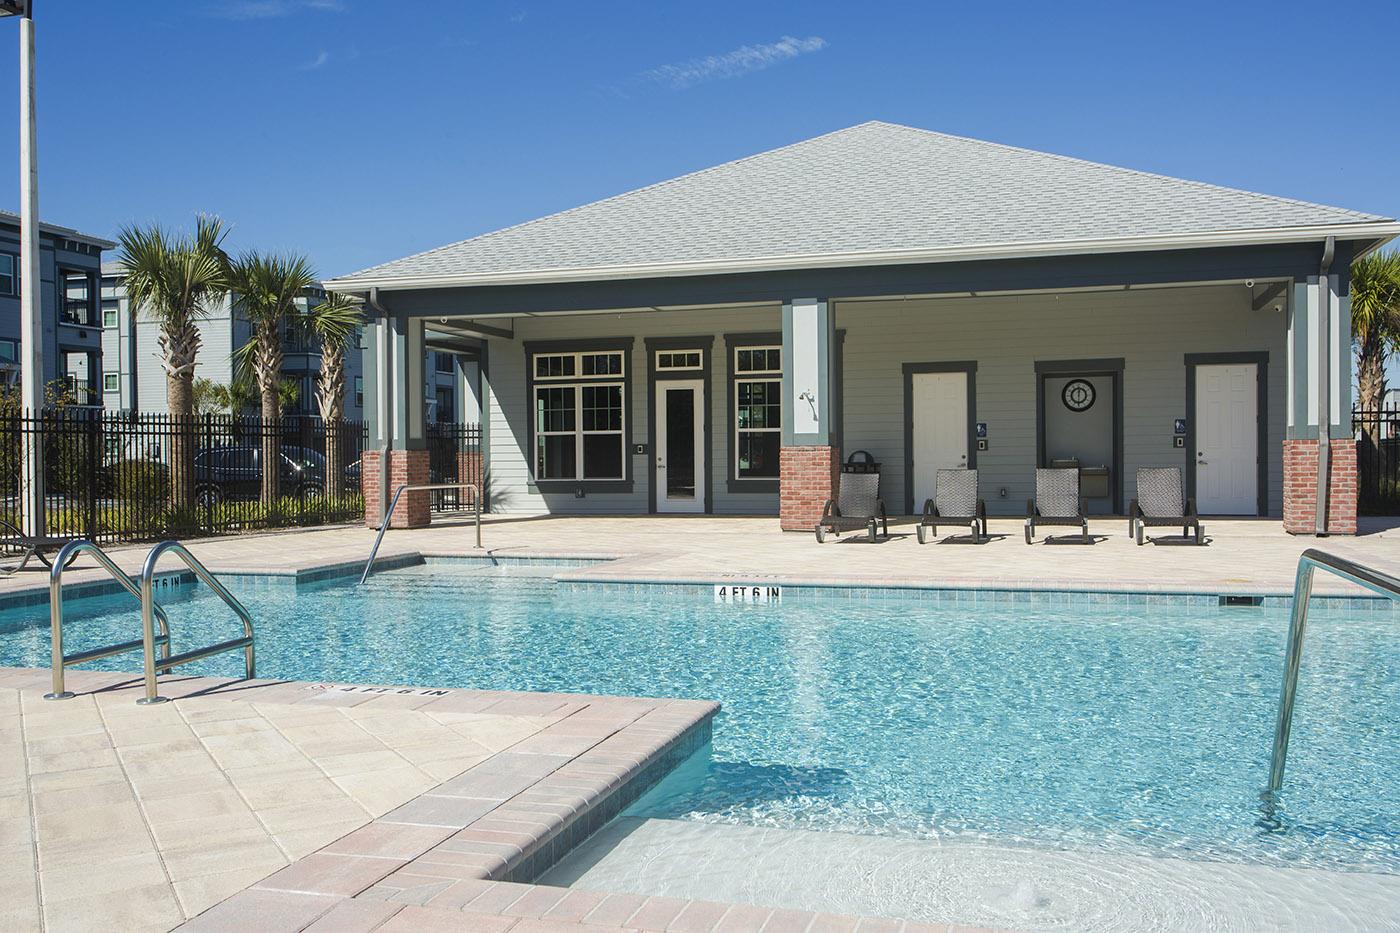 CharlestonEdge-Rental-Apartment-Brandon-Tampa-Florida-Pool-Bedrooms-Pets-Pool-5.jpg